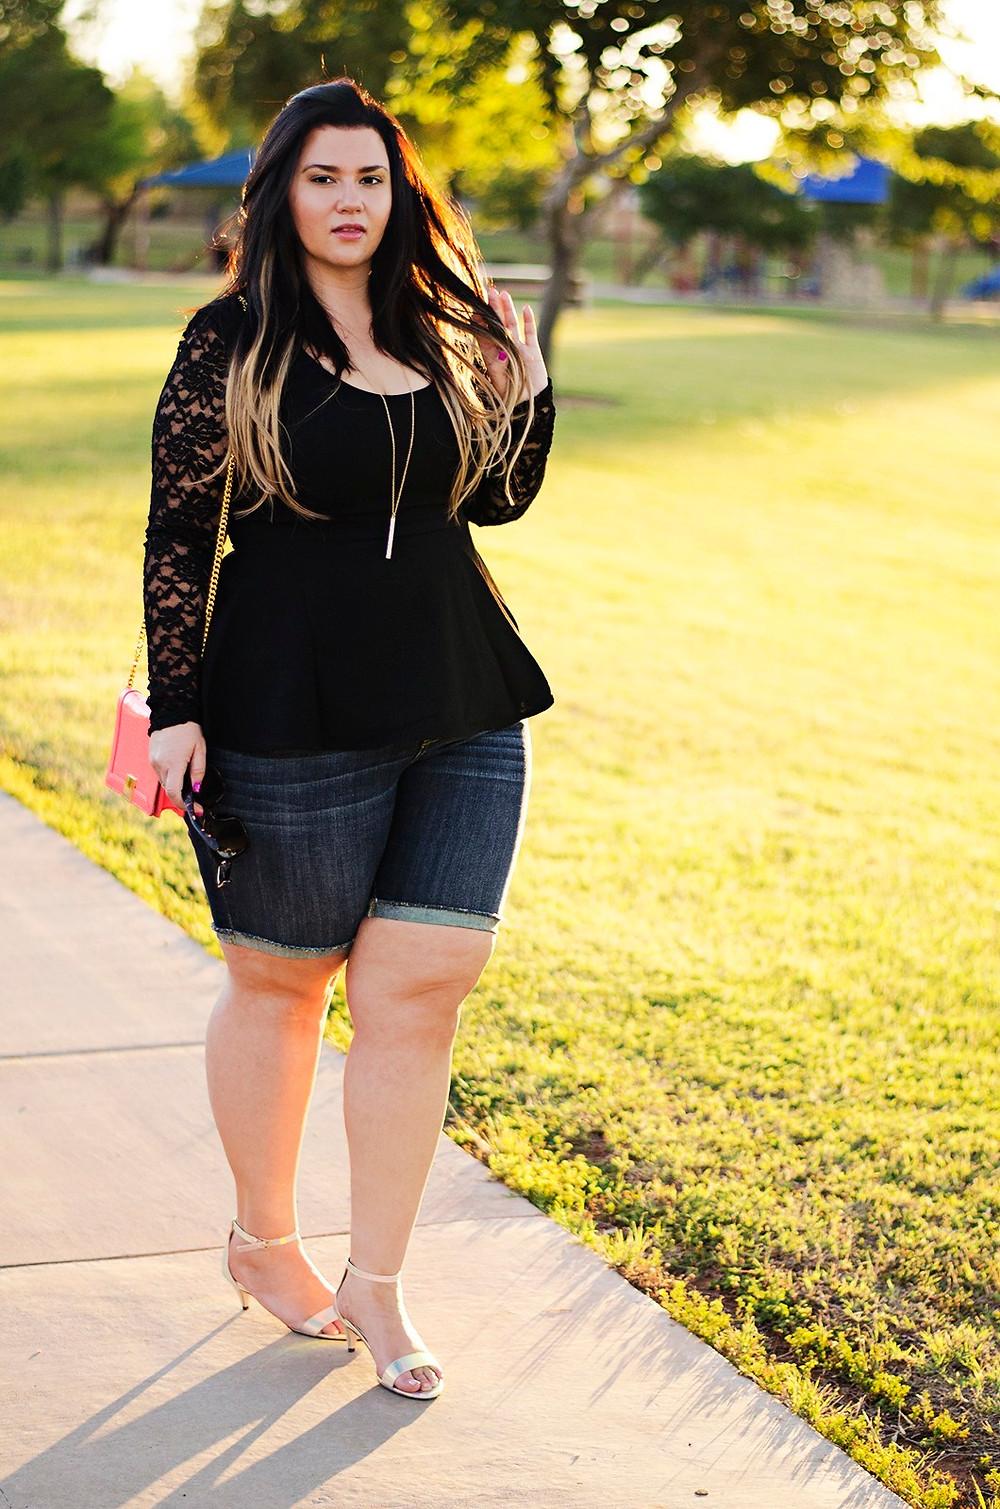 bermuda shorts peplum shirt city chic date night plus size ootd iridescent heels casual simple chic